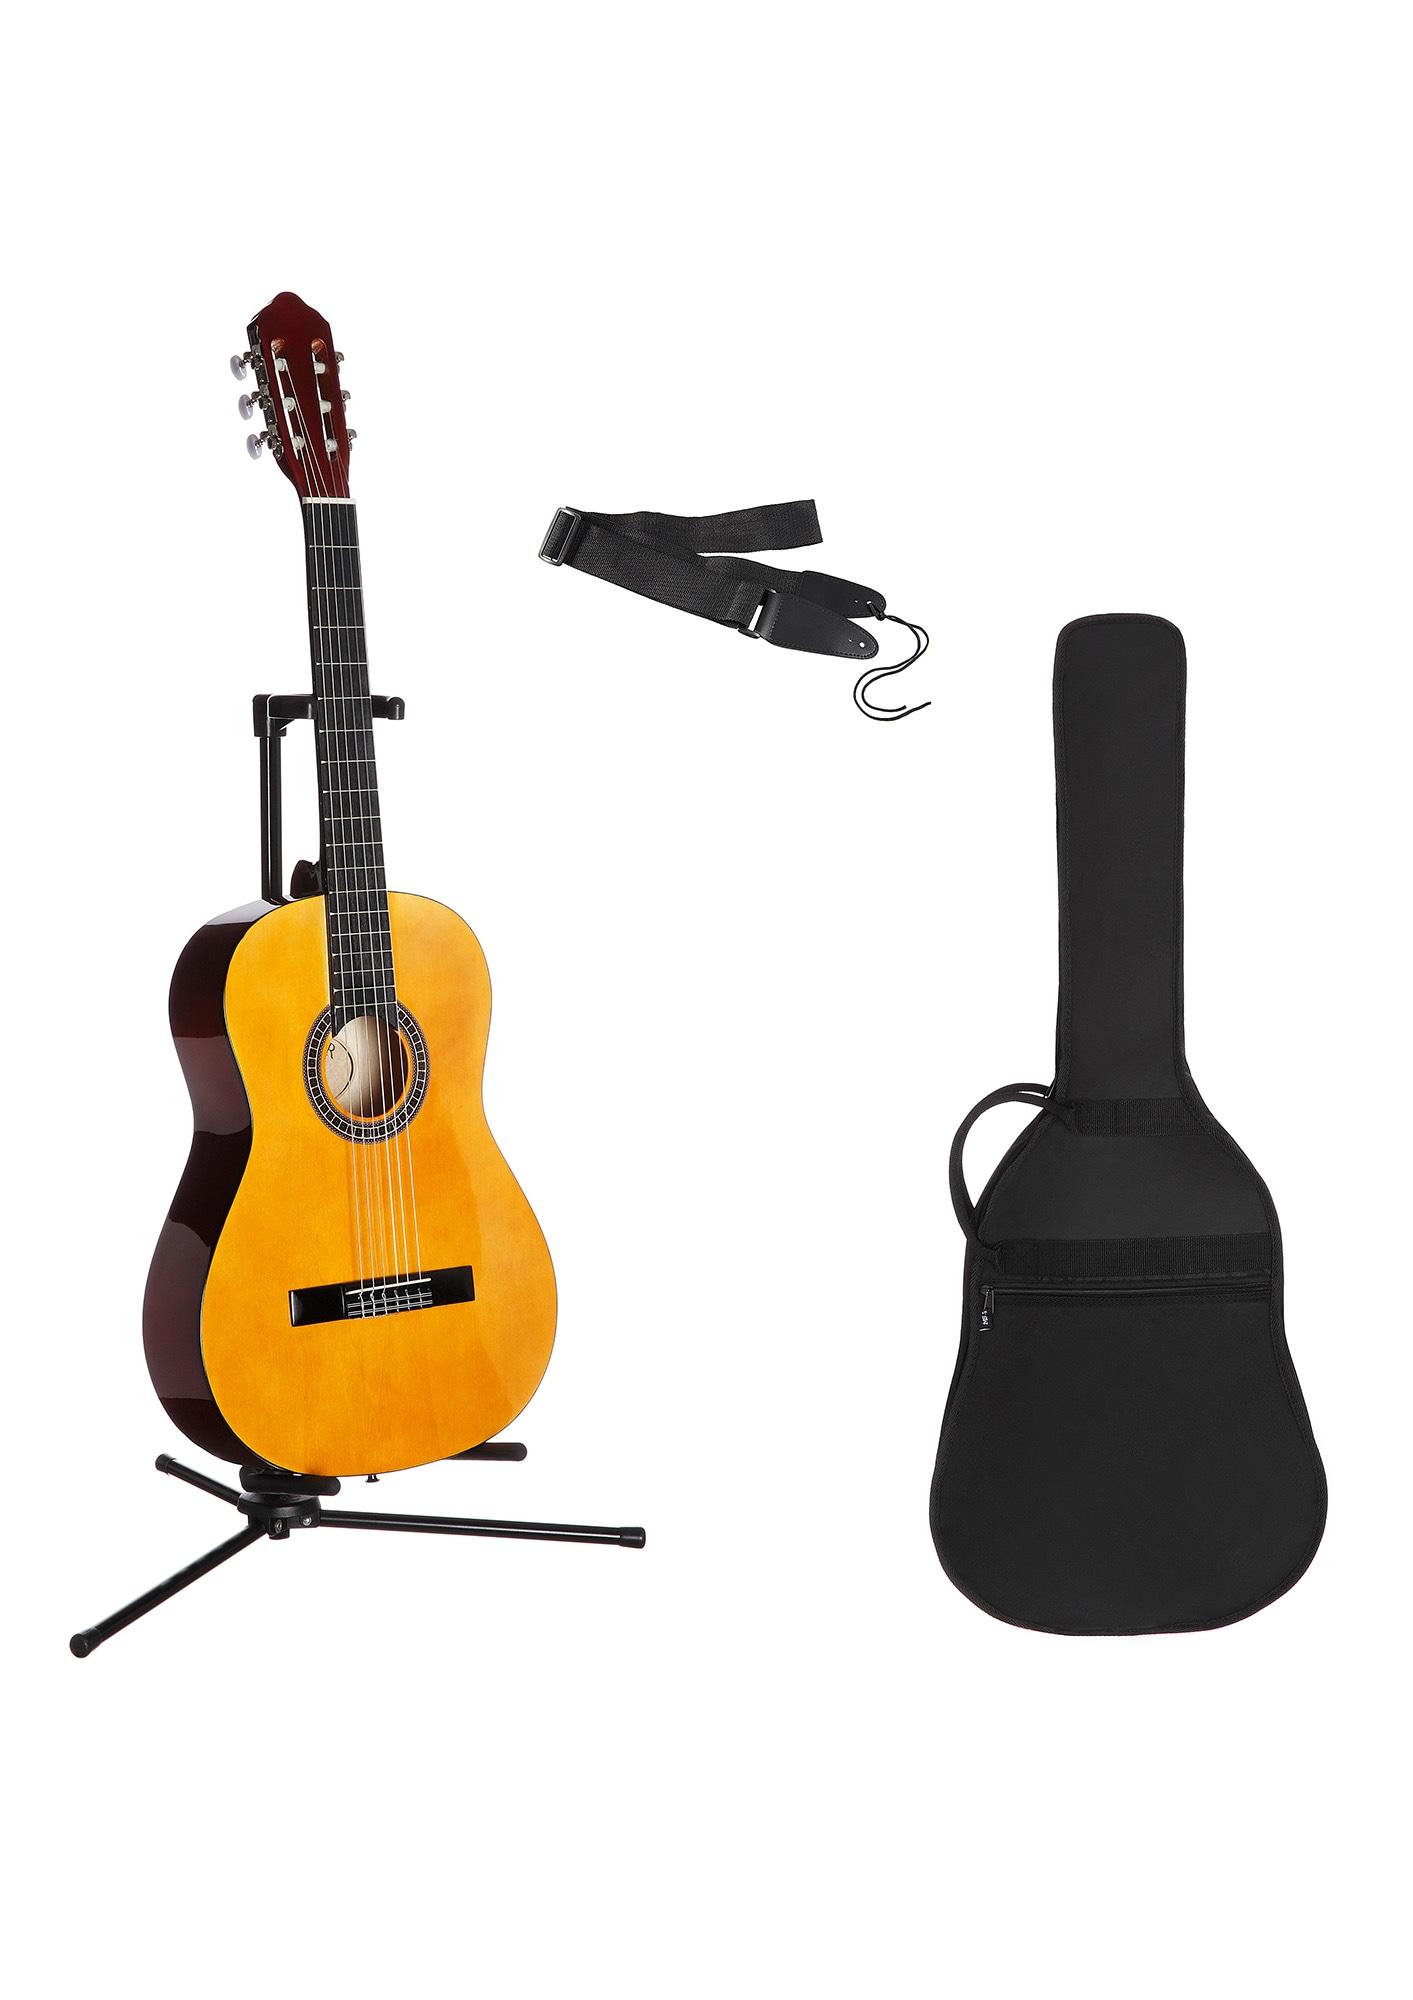 Gitarrenset Konzertgitarre, 1/4, inkl. Gitarrentasche und Gitarrengurt beige Gitarre Musikinstrumente